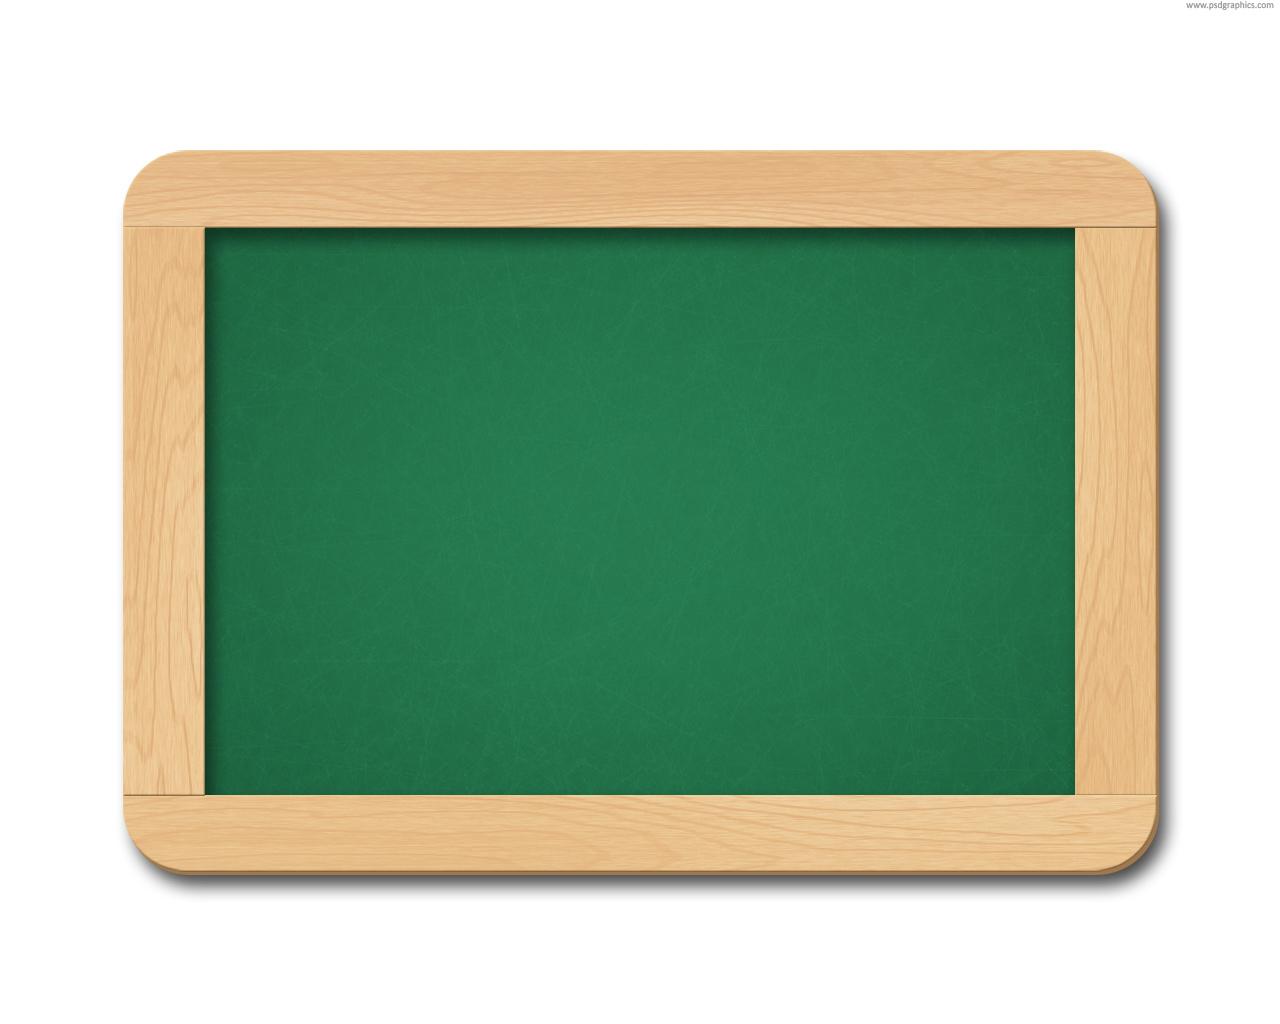 1280x1024 Chalkboard Clip Art Clipart